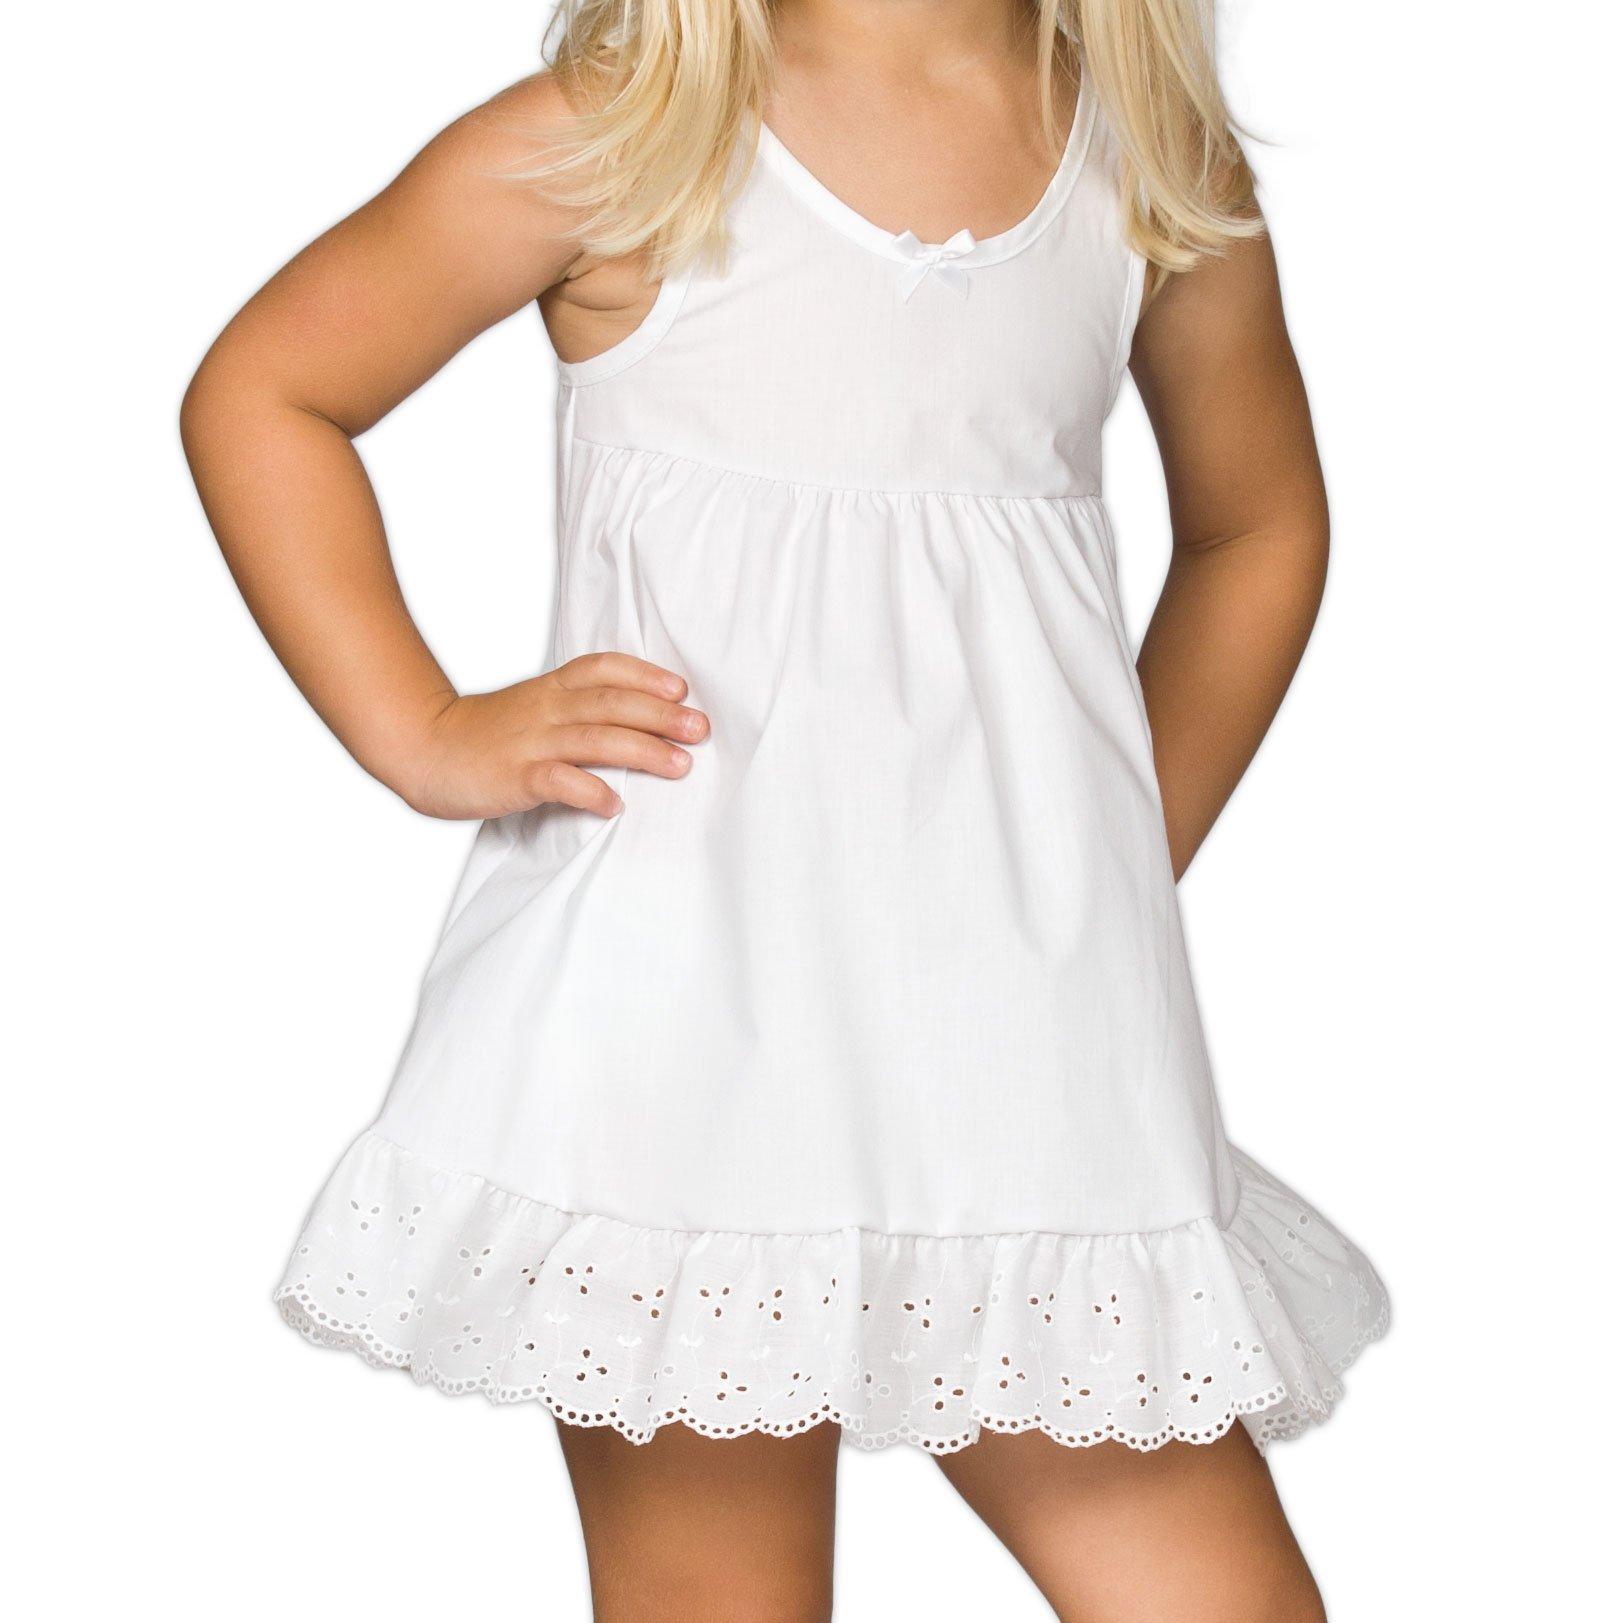 I.C. Collections Baby Girls White Adjustable Tea-Length Slip, 12m